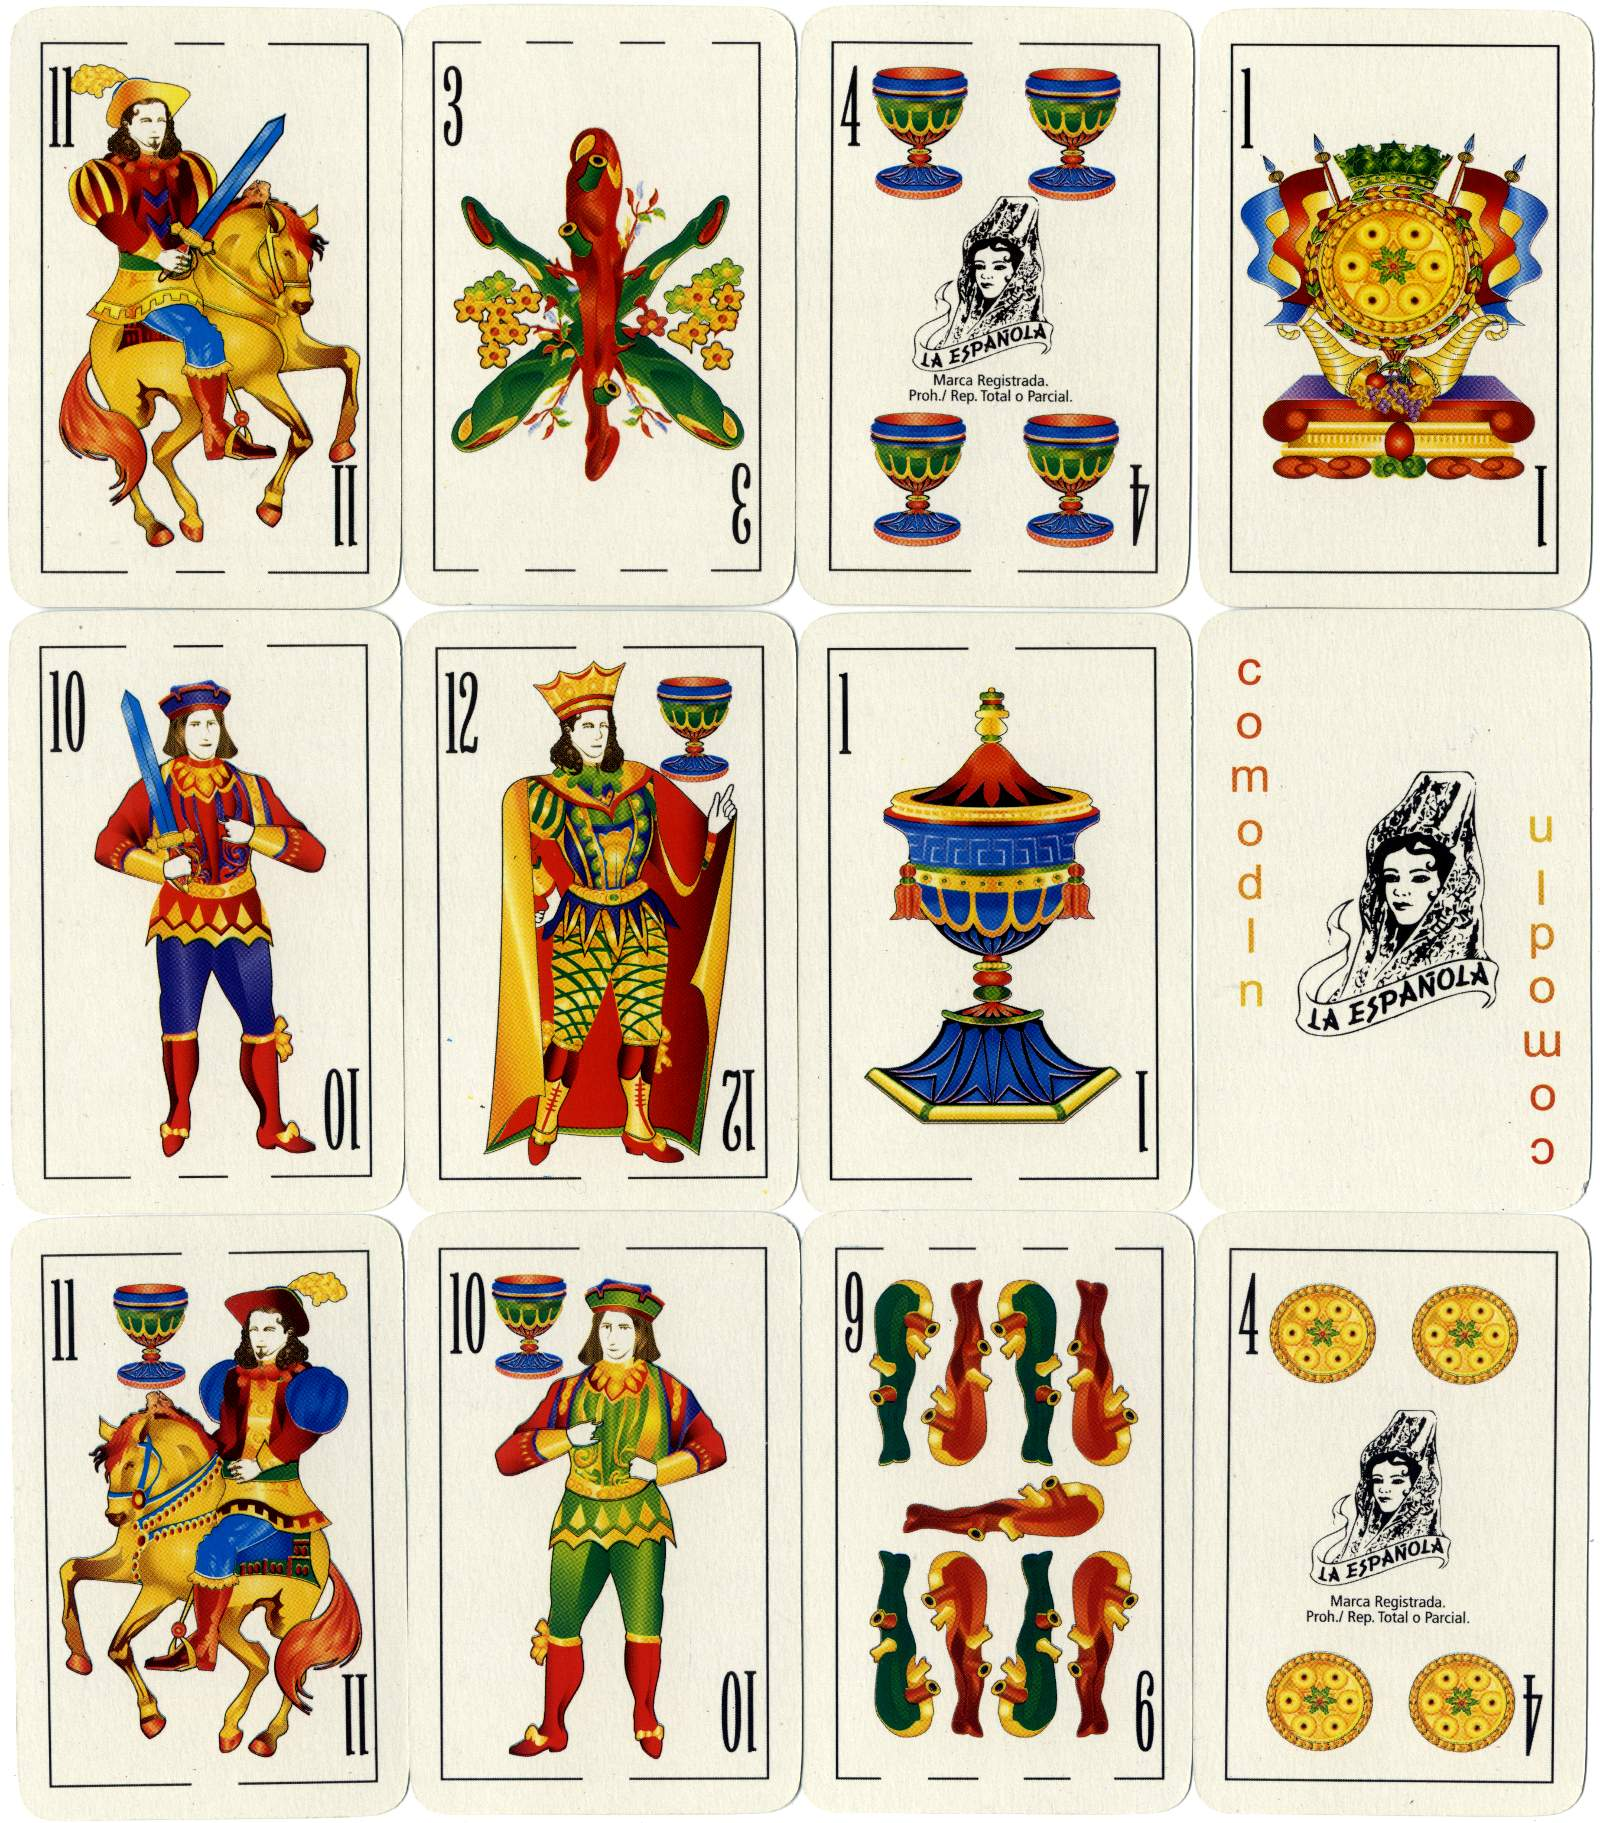 La Española 2000 playing cards, Gráfica 2001's digitally re-drawn version of the original classic 'La Española' Spanish-suited pack